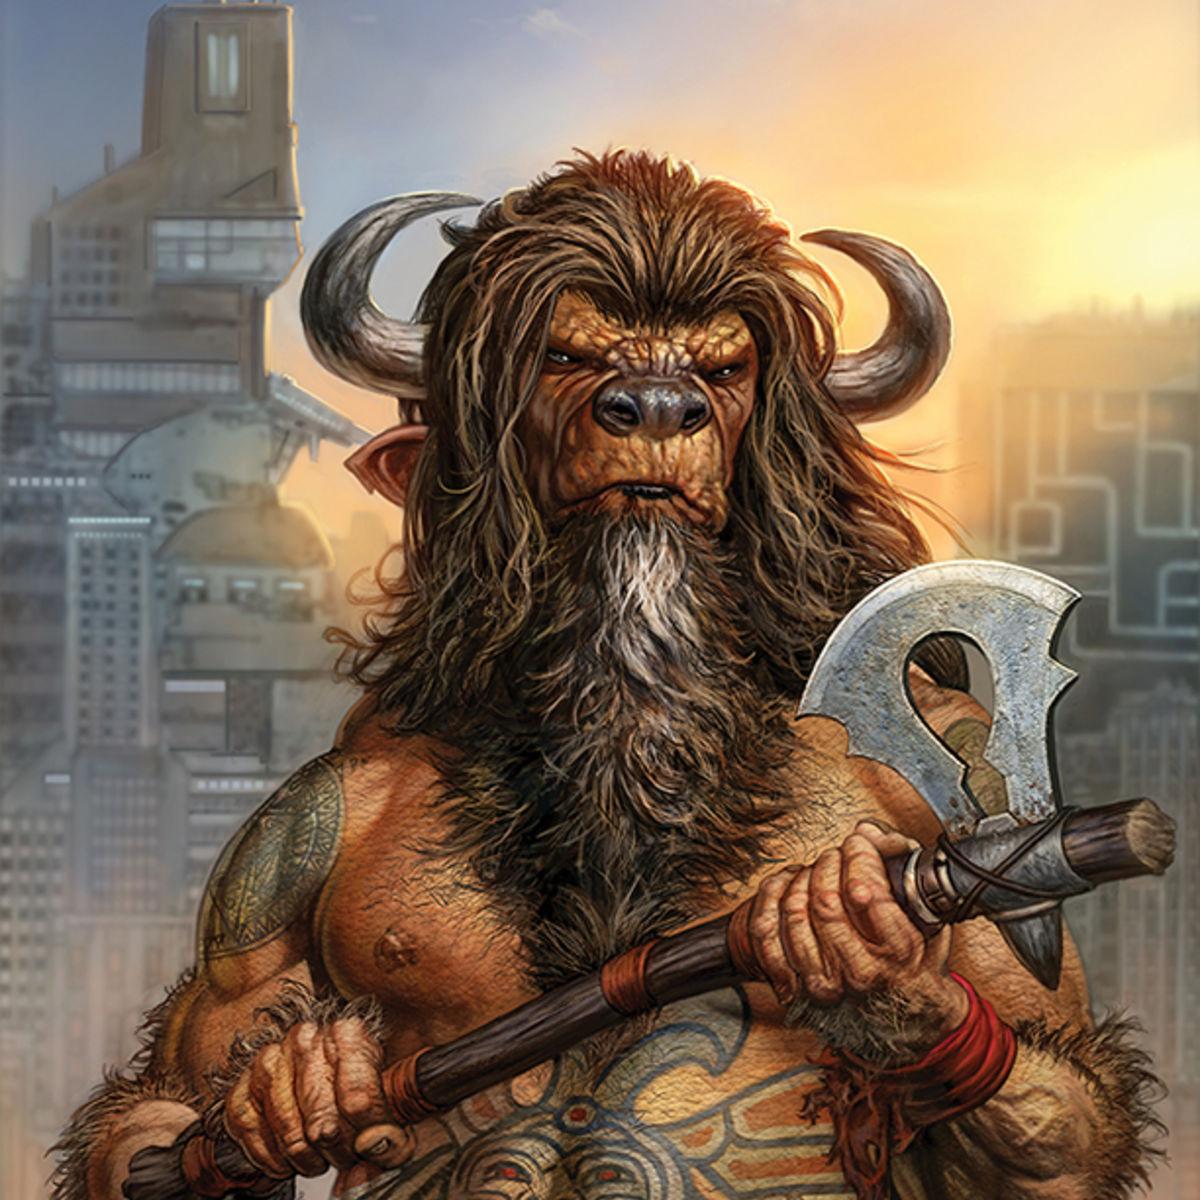 american-gods-comic-book-cover_0.jpg